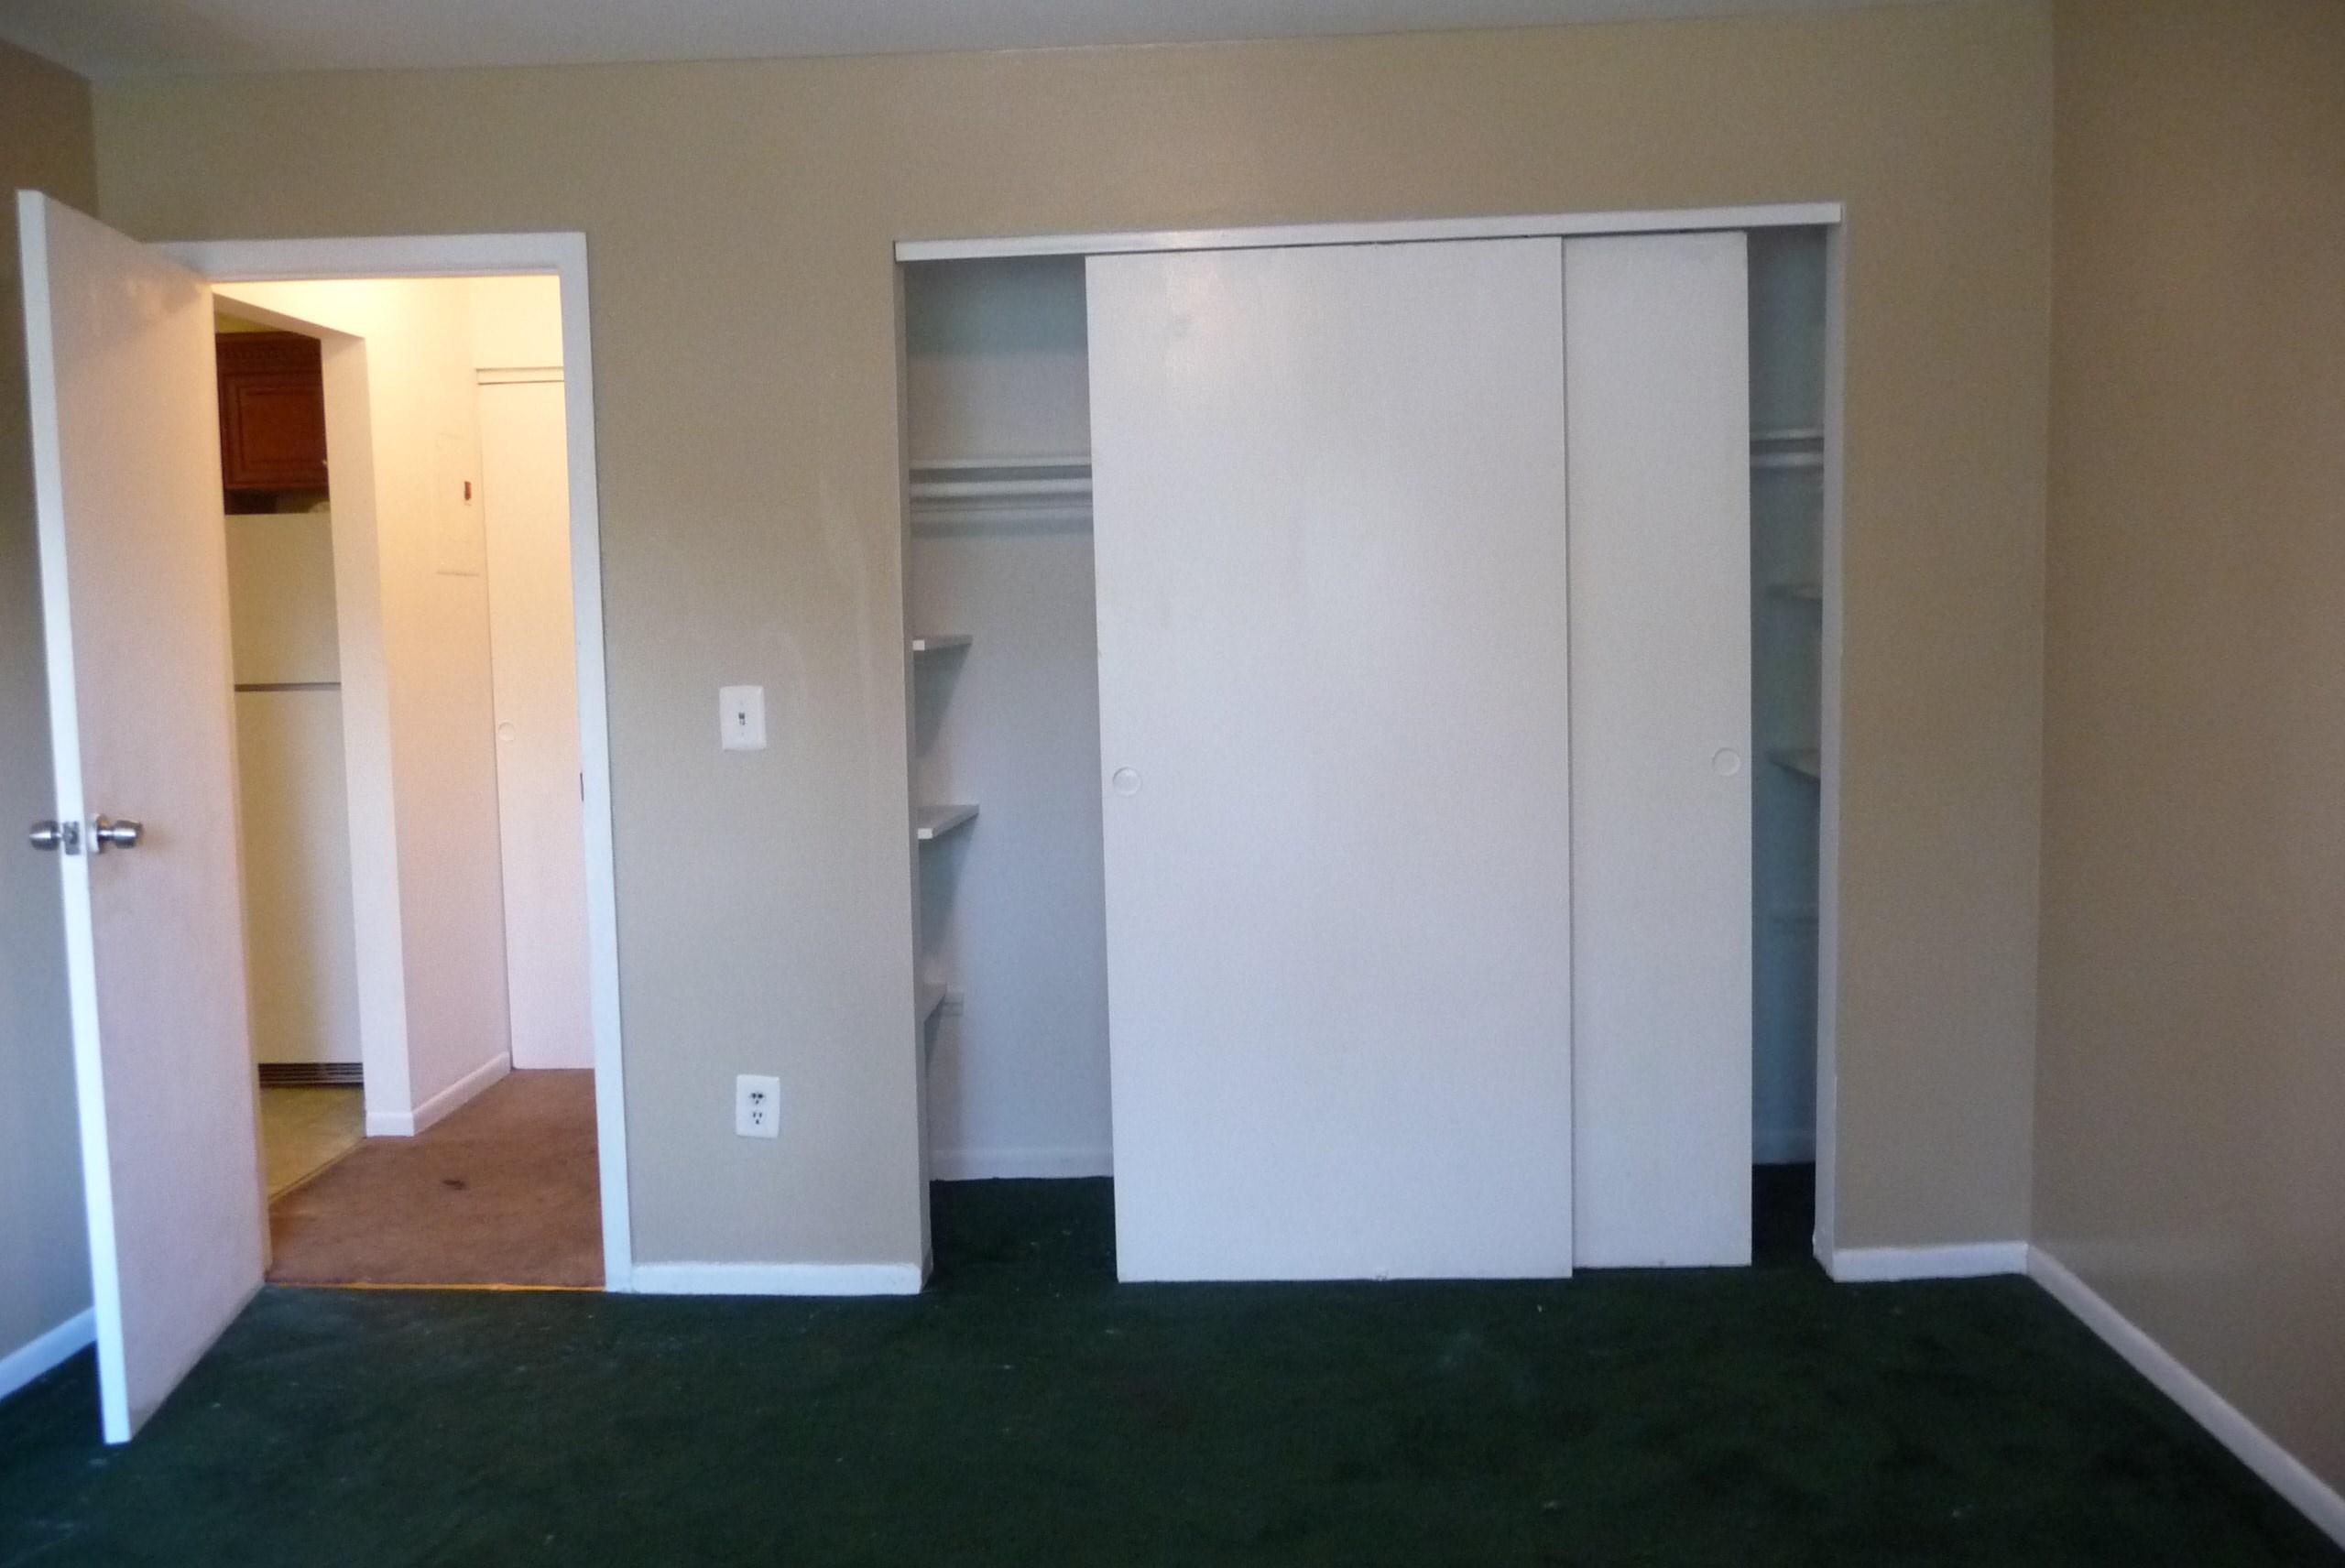 one bedroomone bath condo for rent